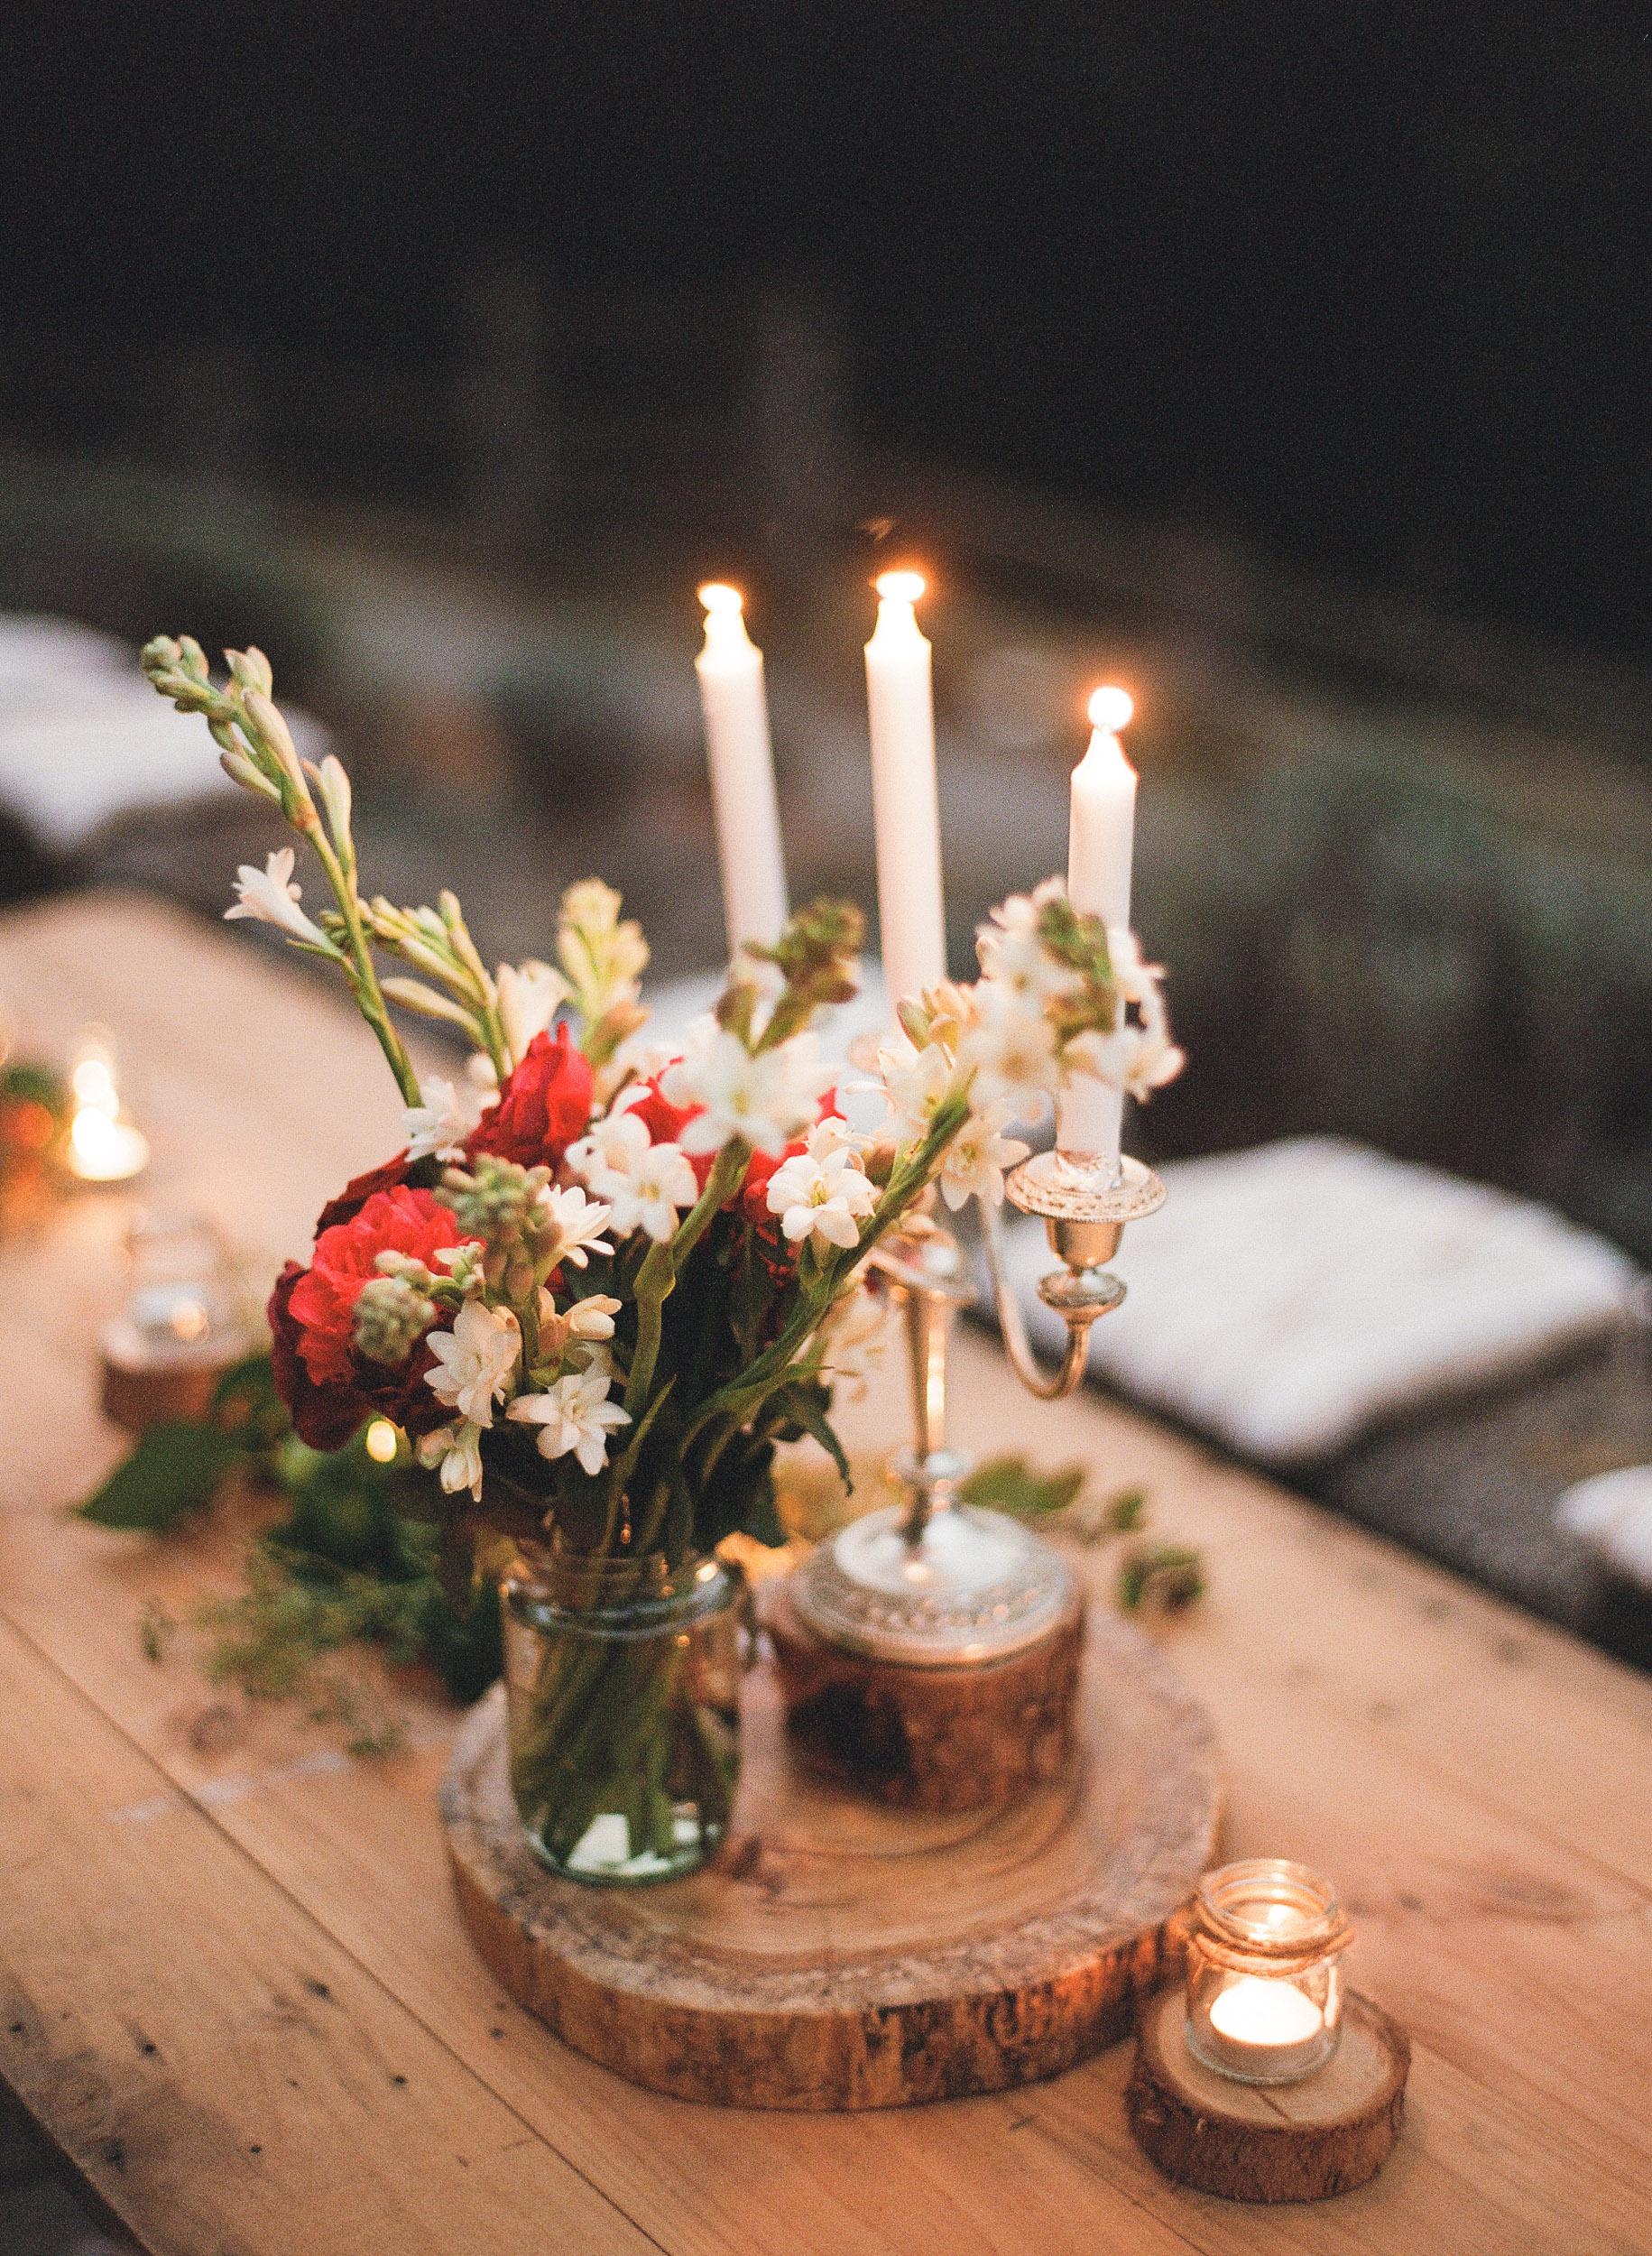 wedding (12 of 24) - 000053170008.jpg